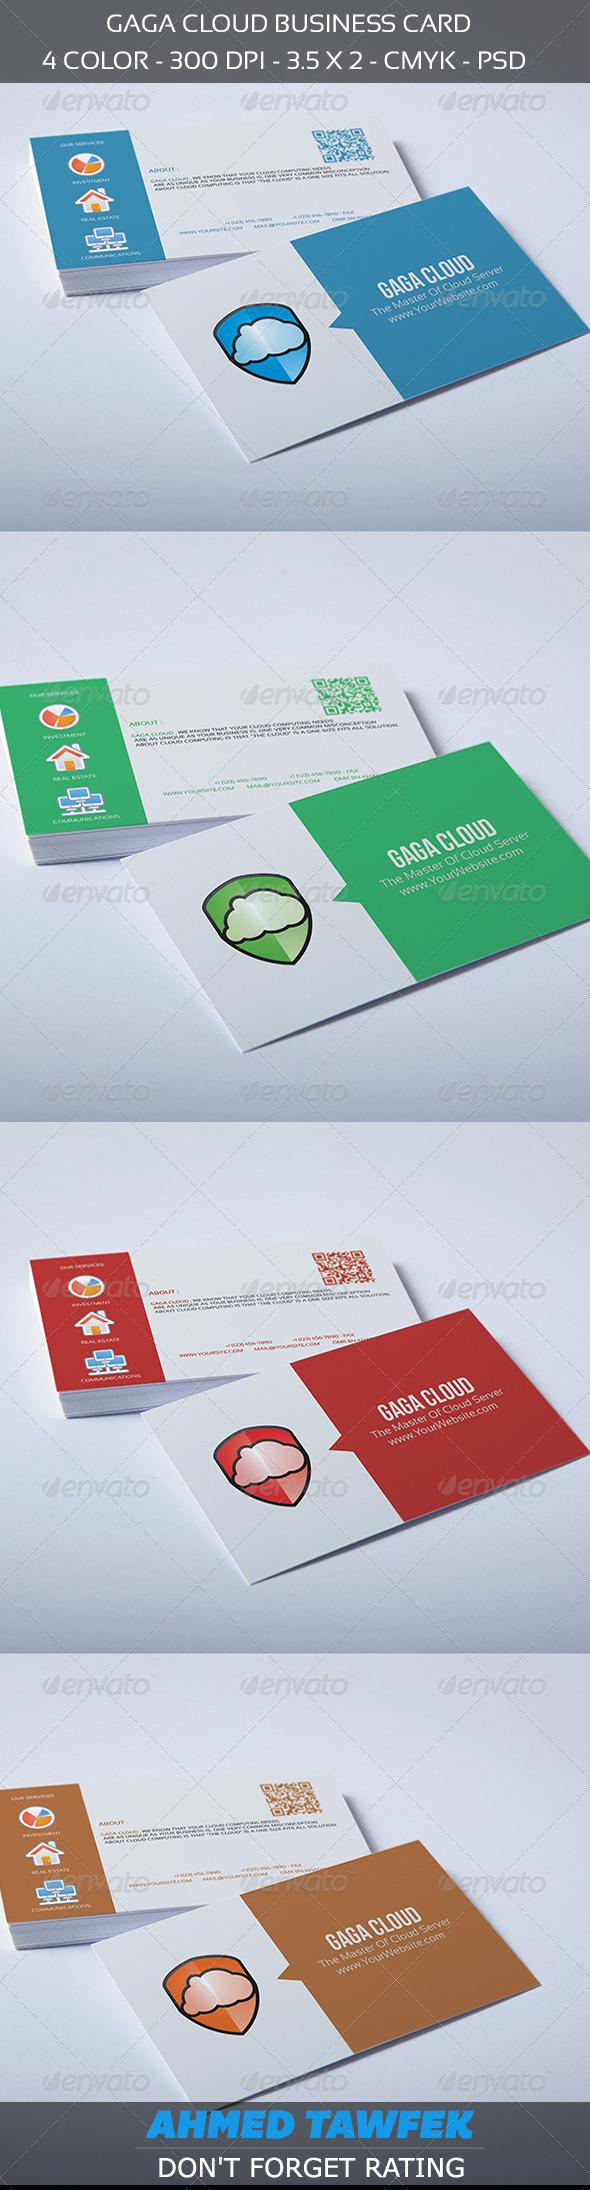 GraphicRiver Gaga Cloud Business Card 4418542